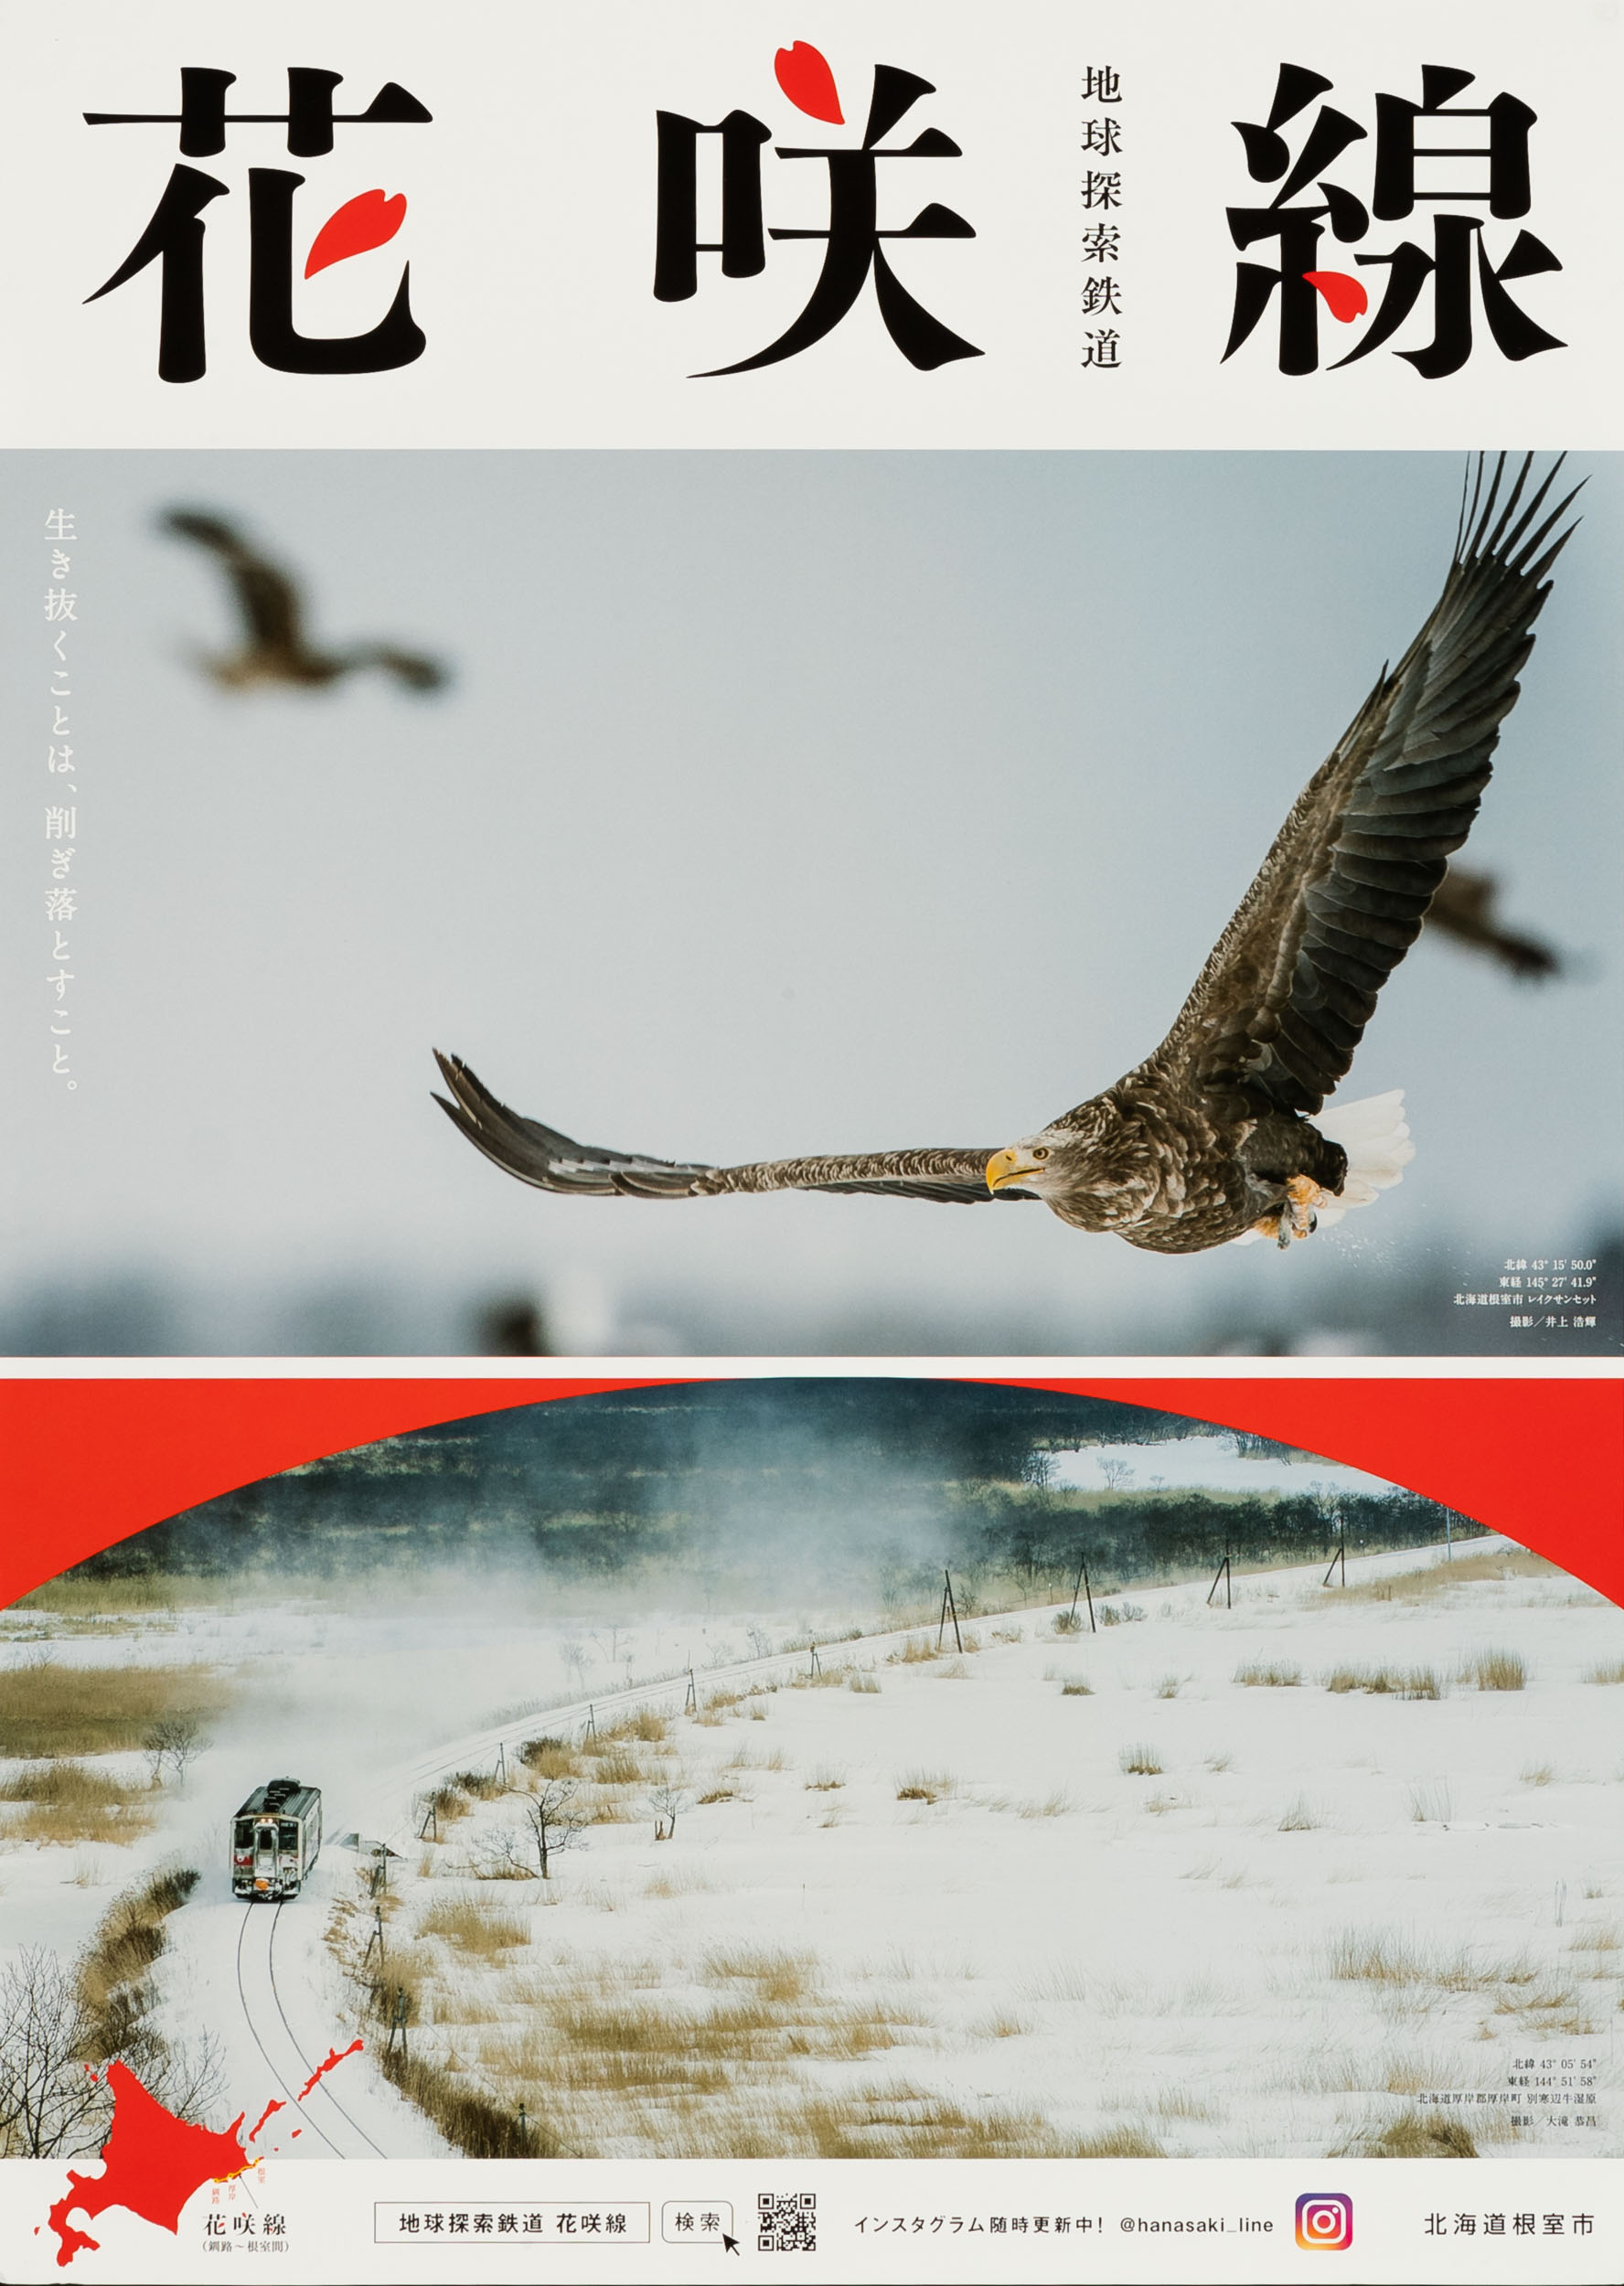 「地球探索鉄道 花咲線」シリーズ5点